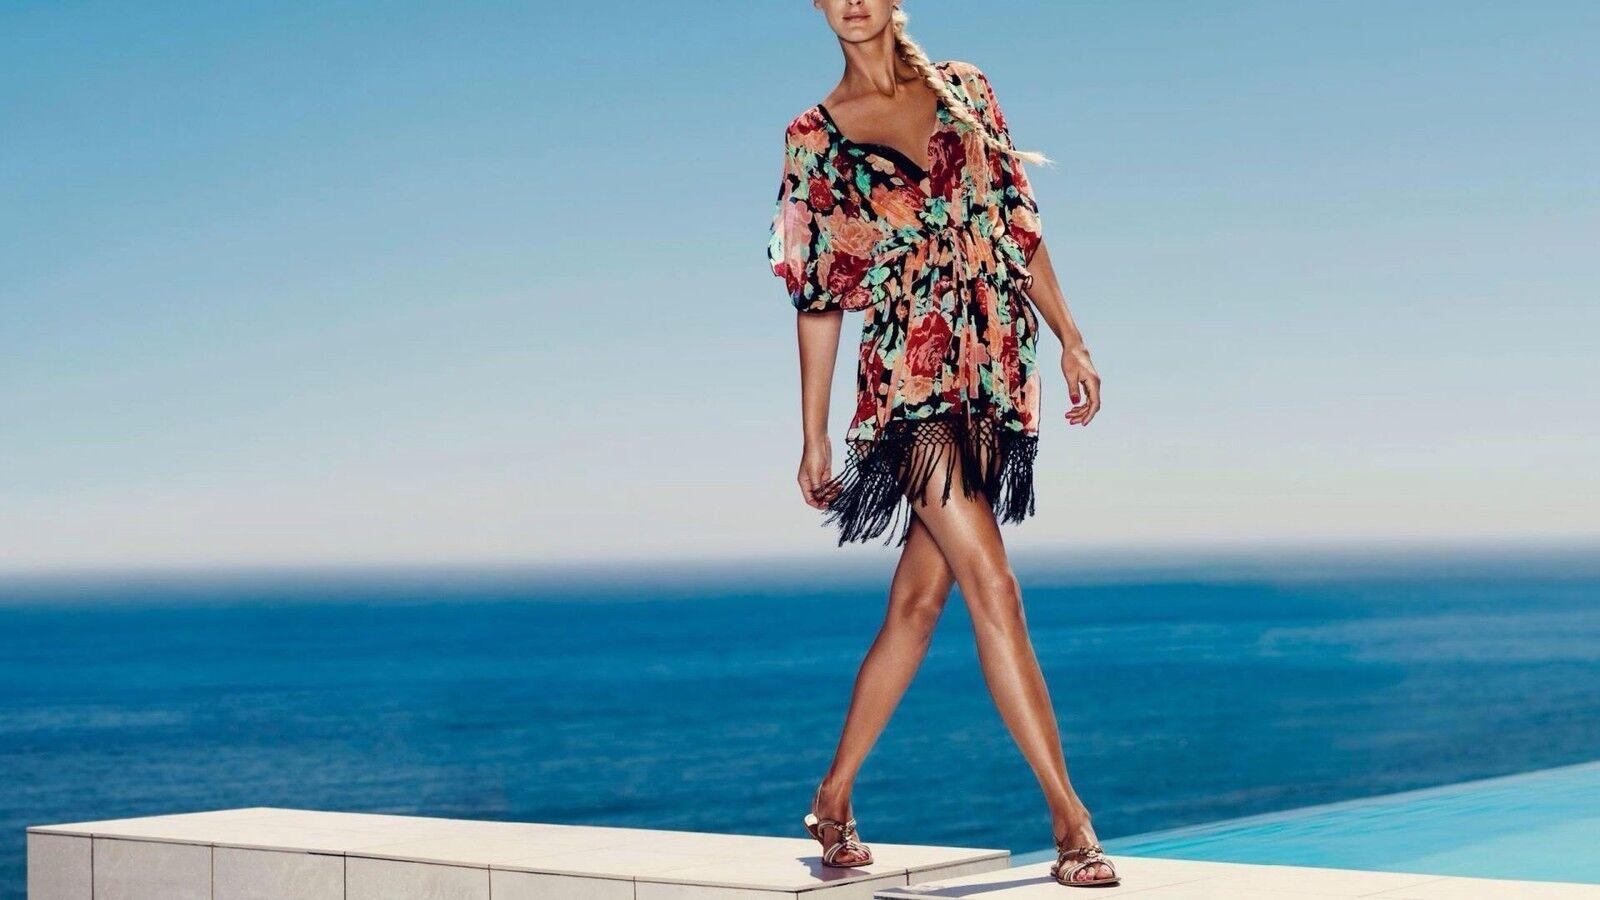 The+Palm+Beach+Islander+Boutique